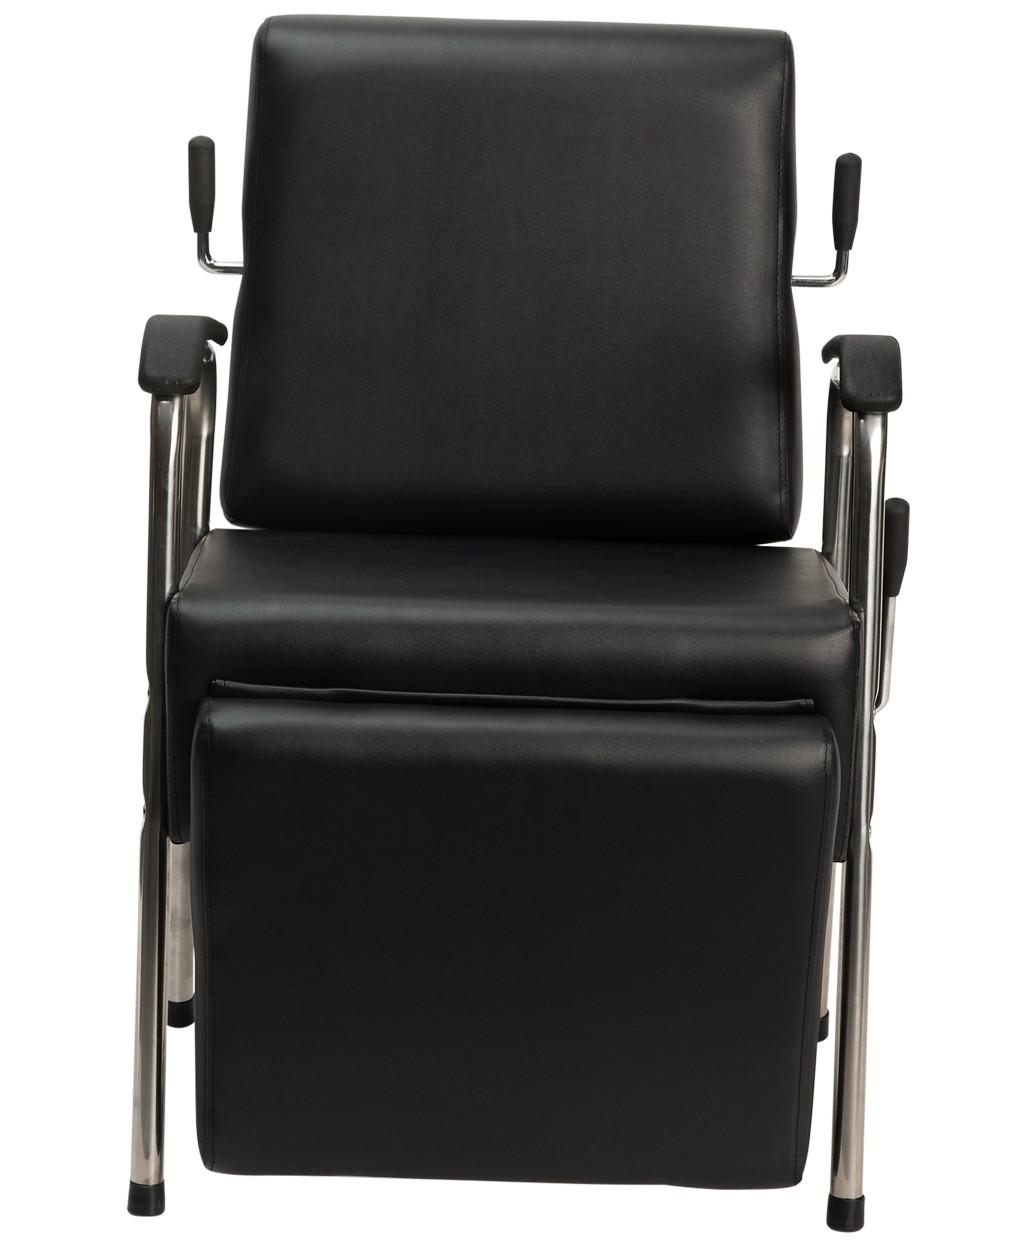 Jamie Shampoo Chair with Leg Rest